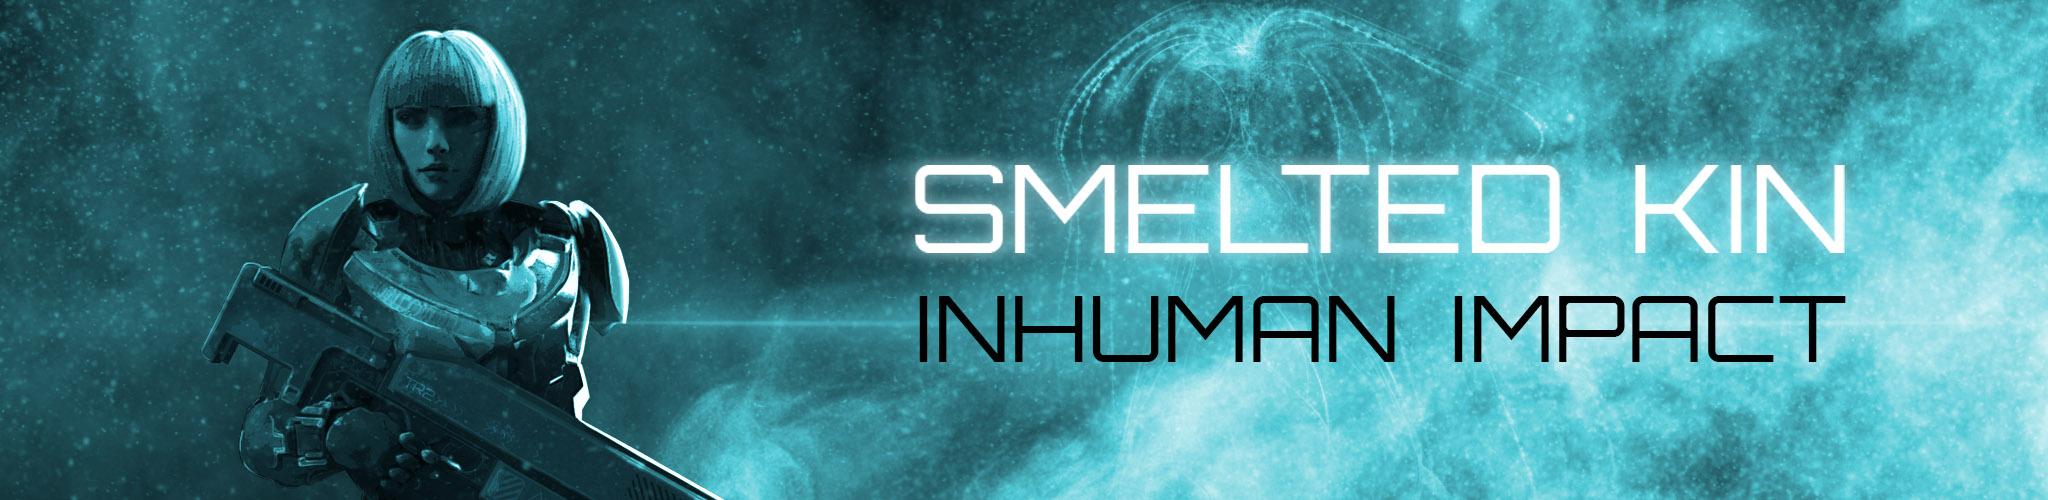 Smelted Kin: Inhuman Impact